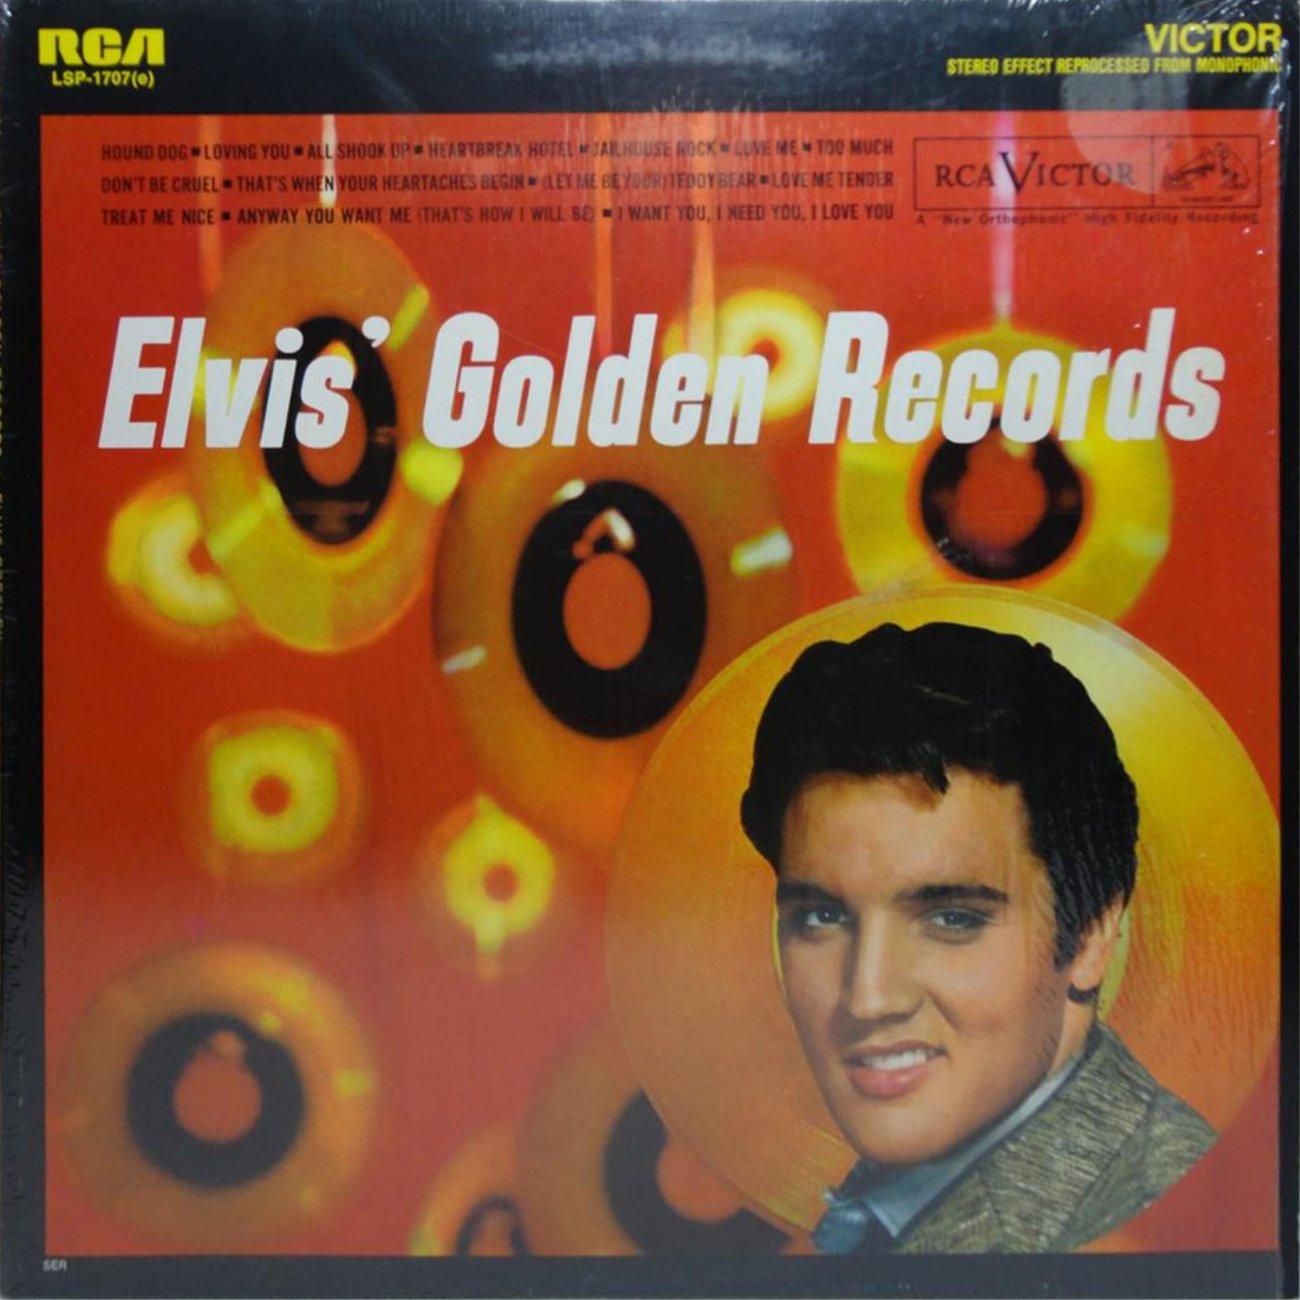 ELVIS' GOLD RECORDS  Lsp1707as8kcm